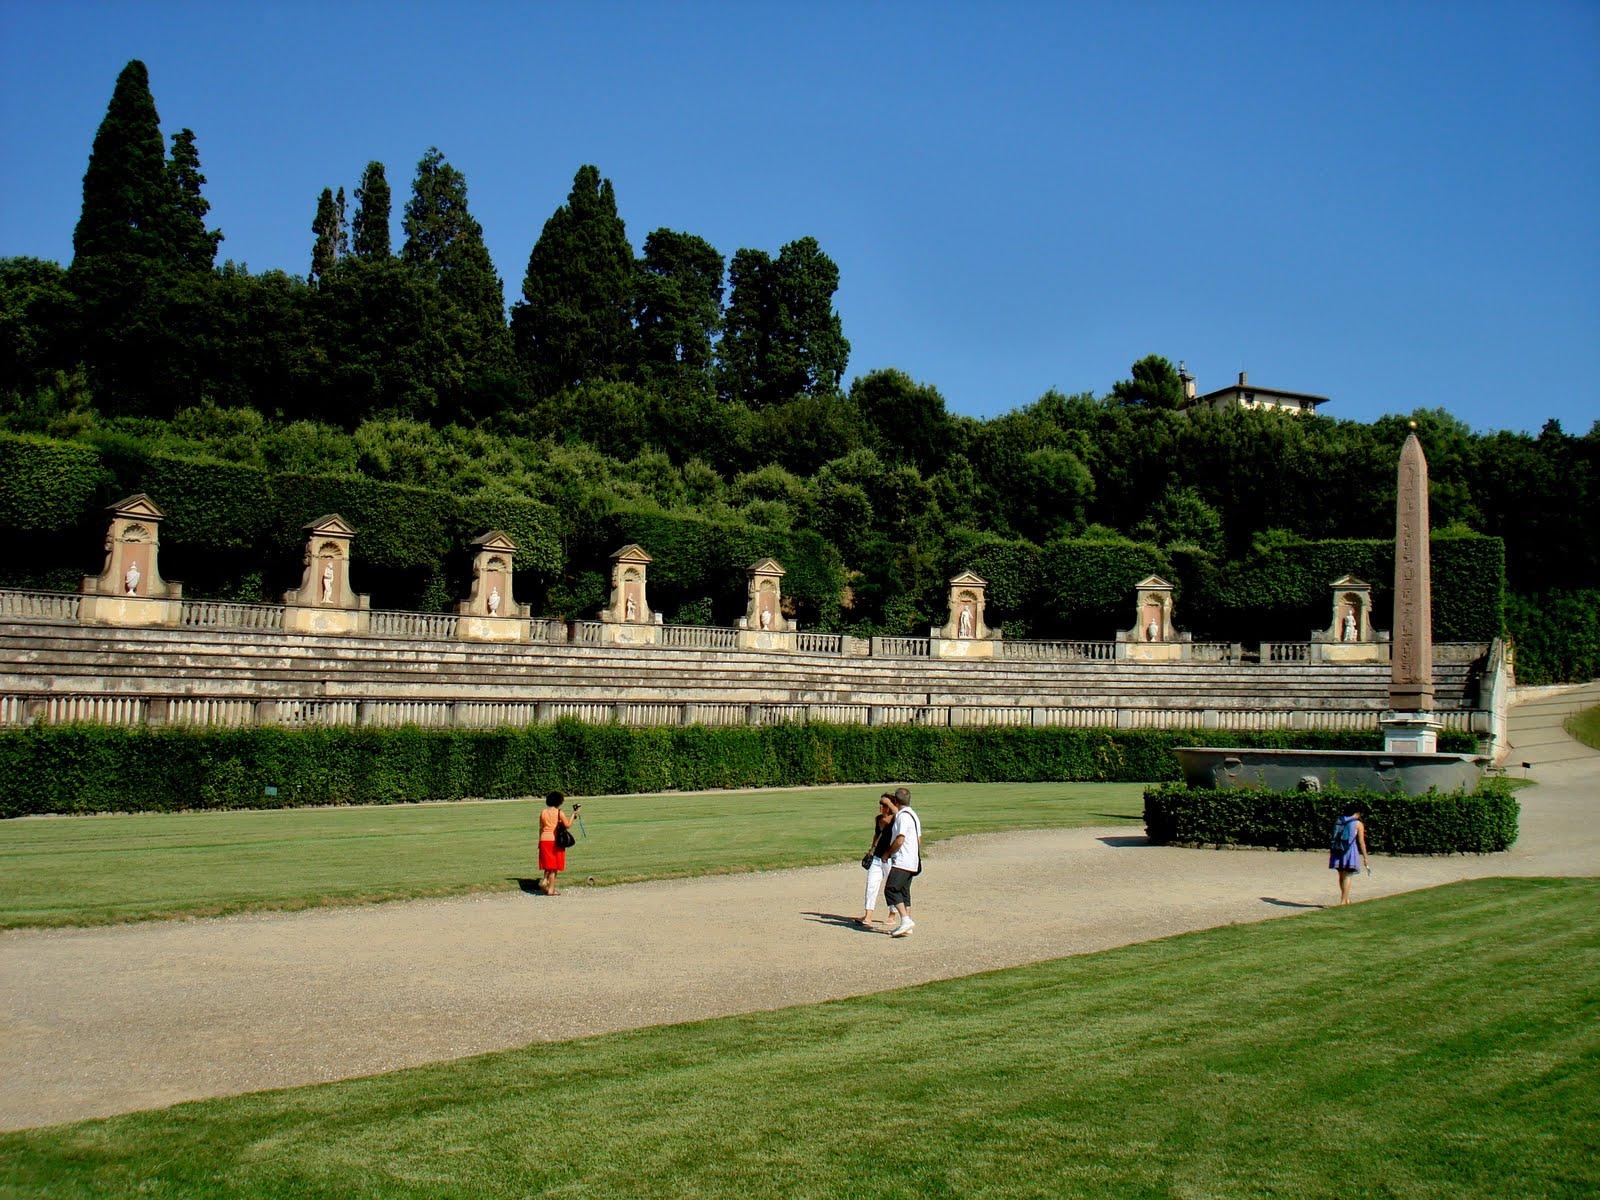 Maria s Italian Adventure Pitti Palace & Boboli Gardens July 22